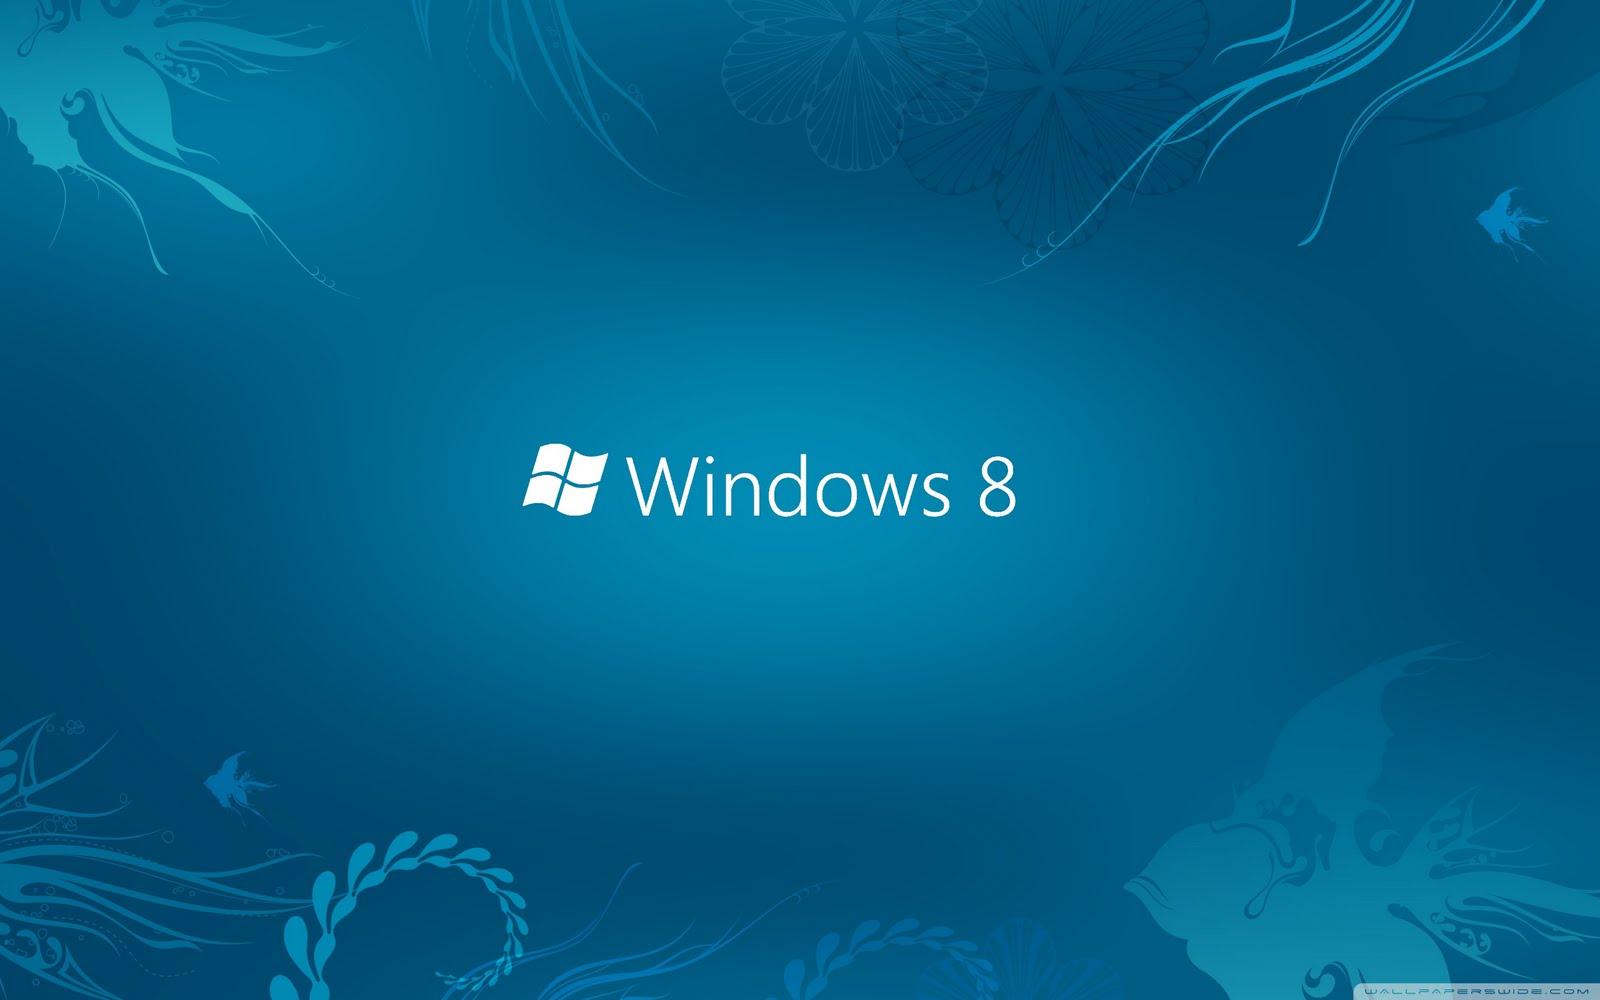 Windows 8 Top Cool HD Desktop Wallpaper 1600x1000